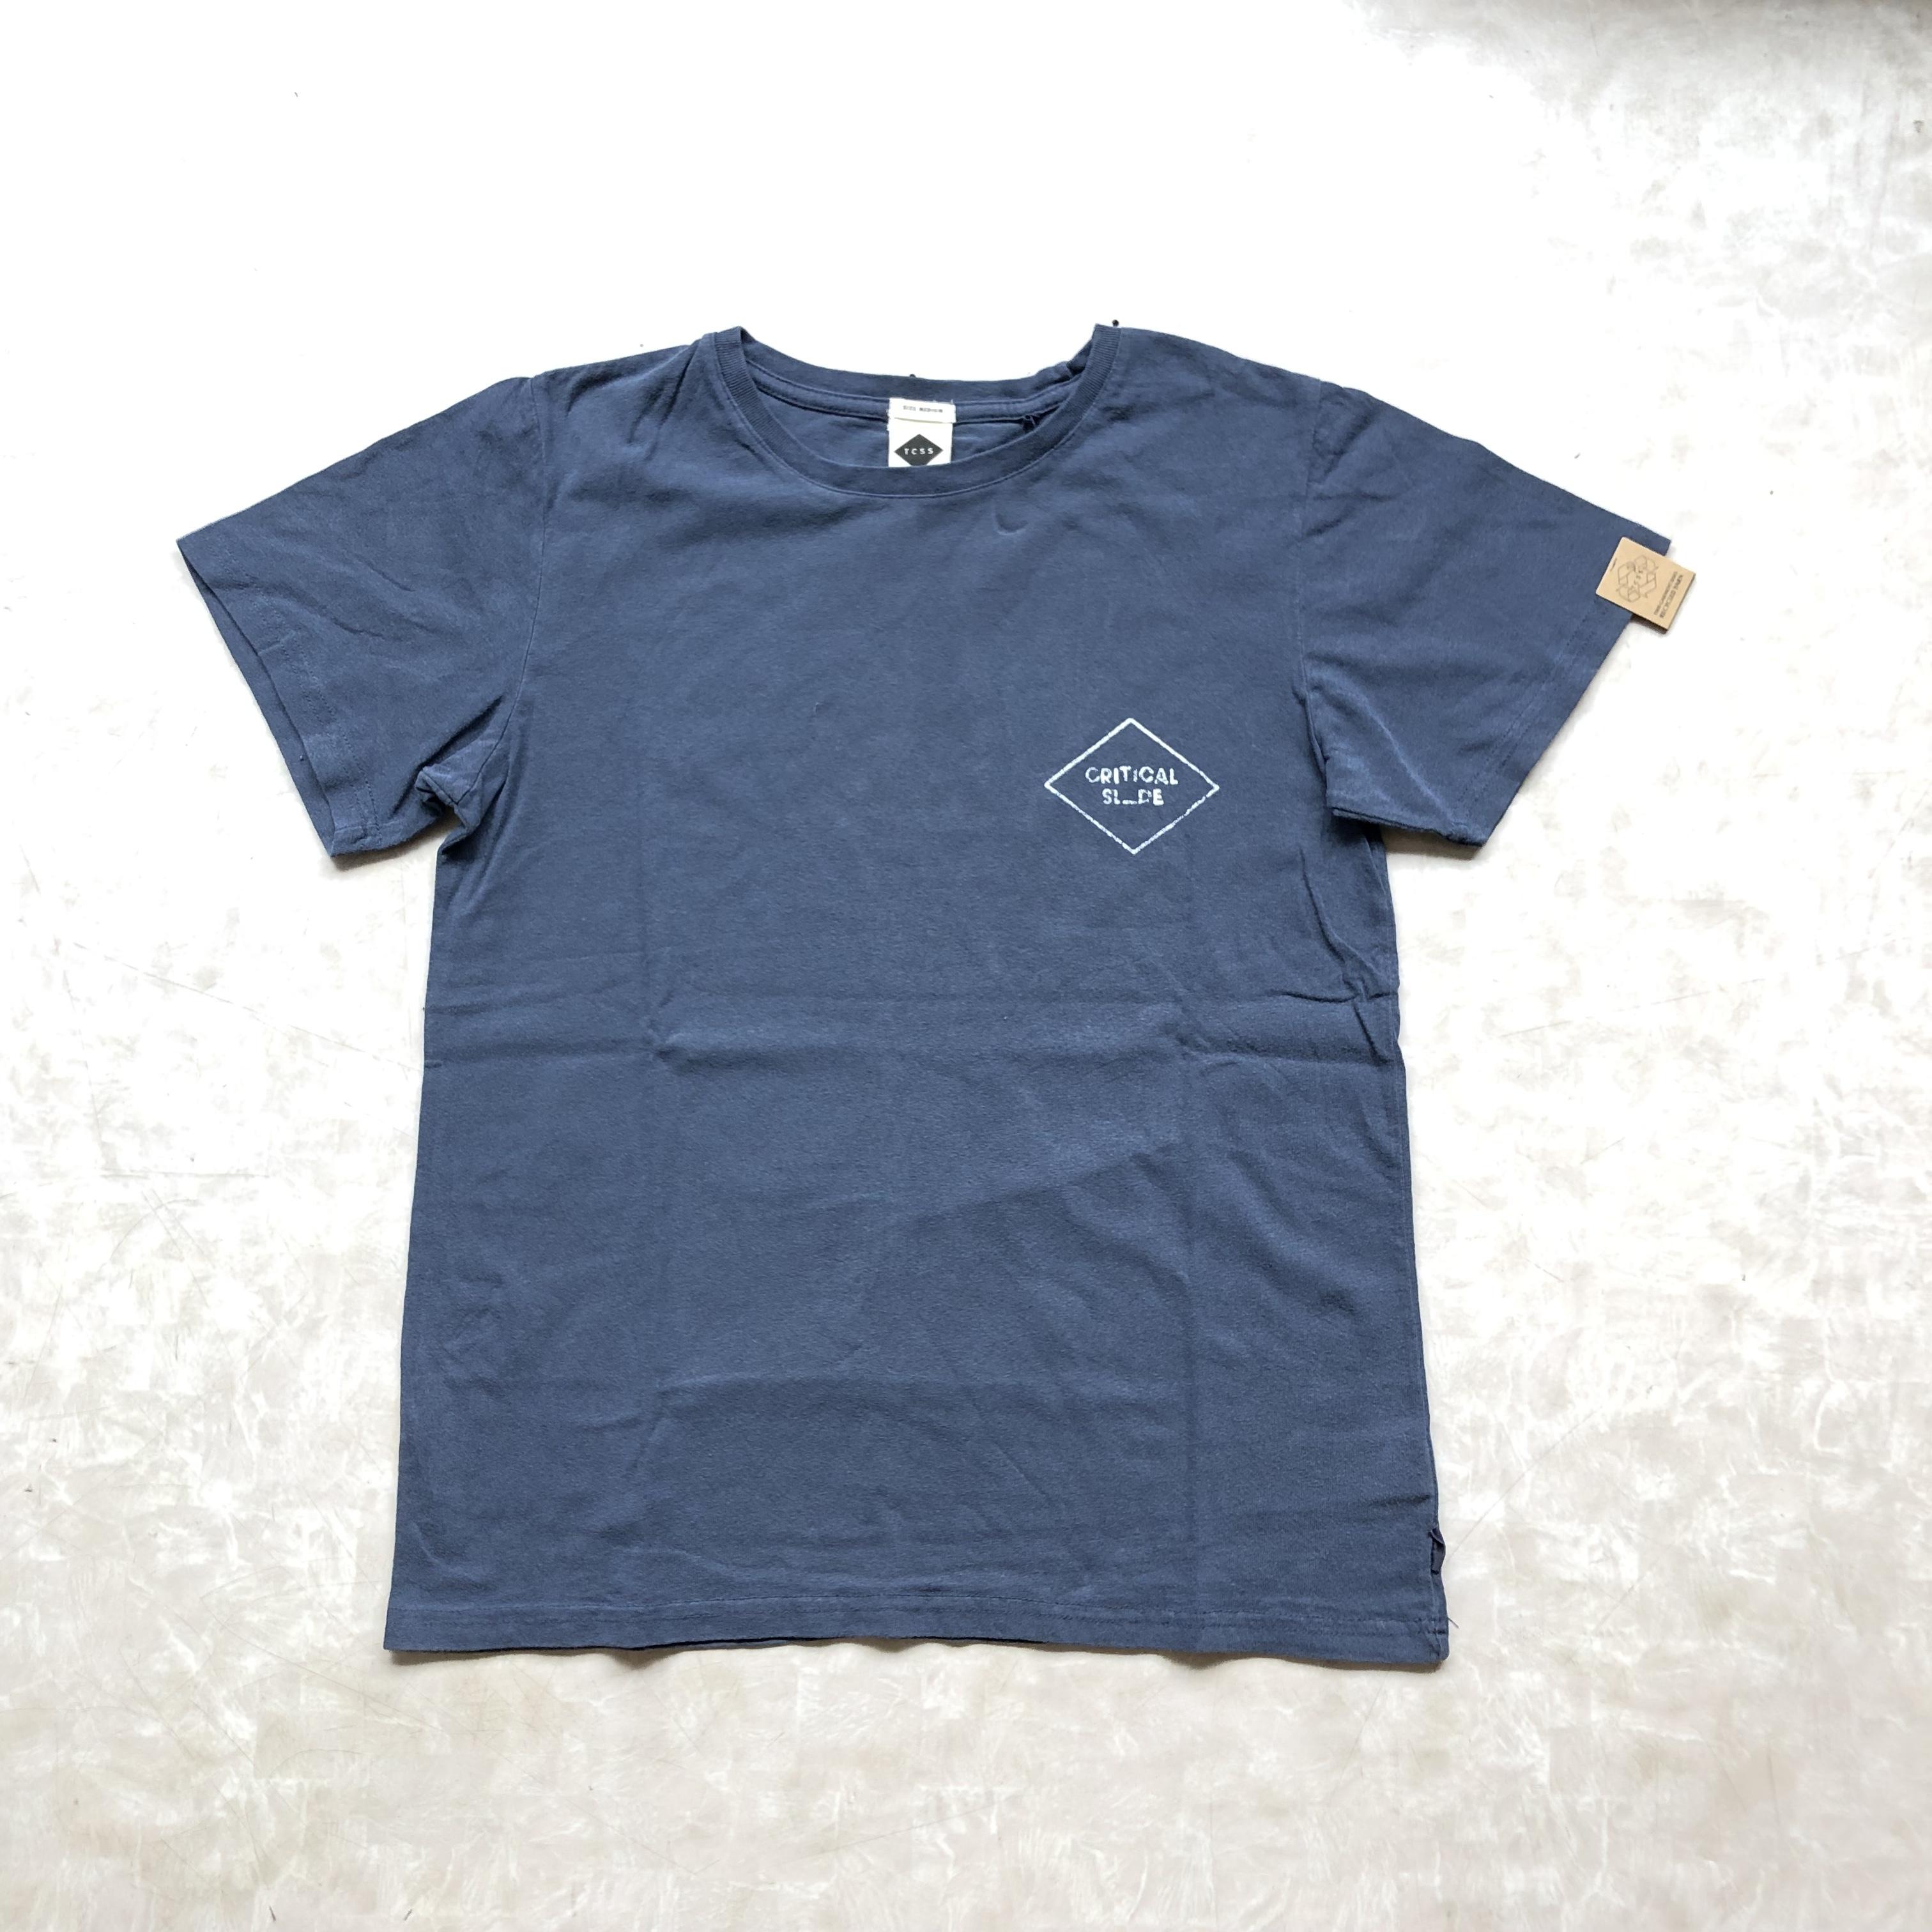 TCSS Critical Slide VOCAL Tシャツ 半袖 ロゴT ネイビー